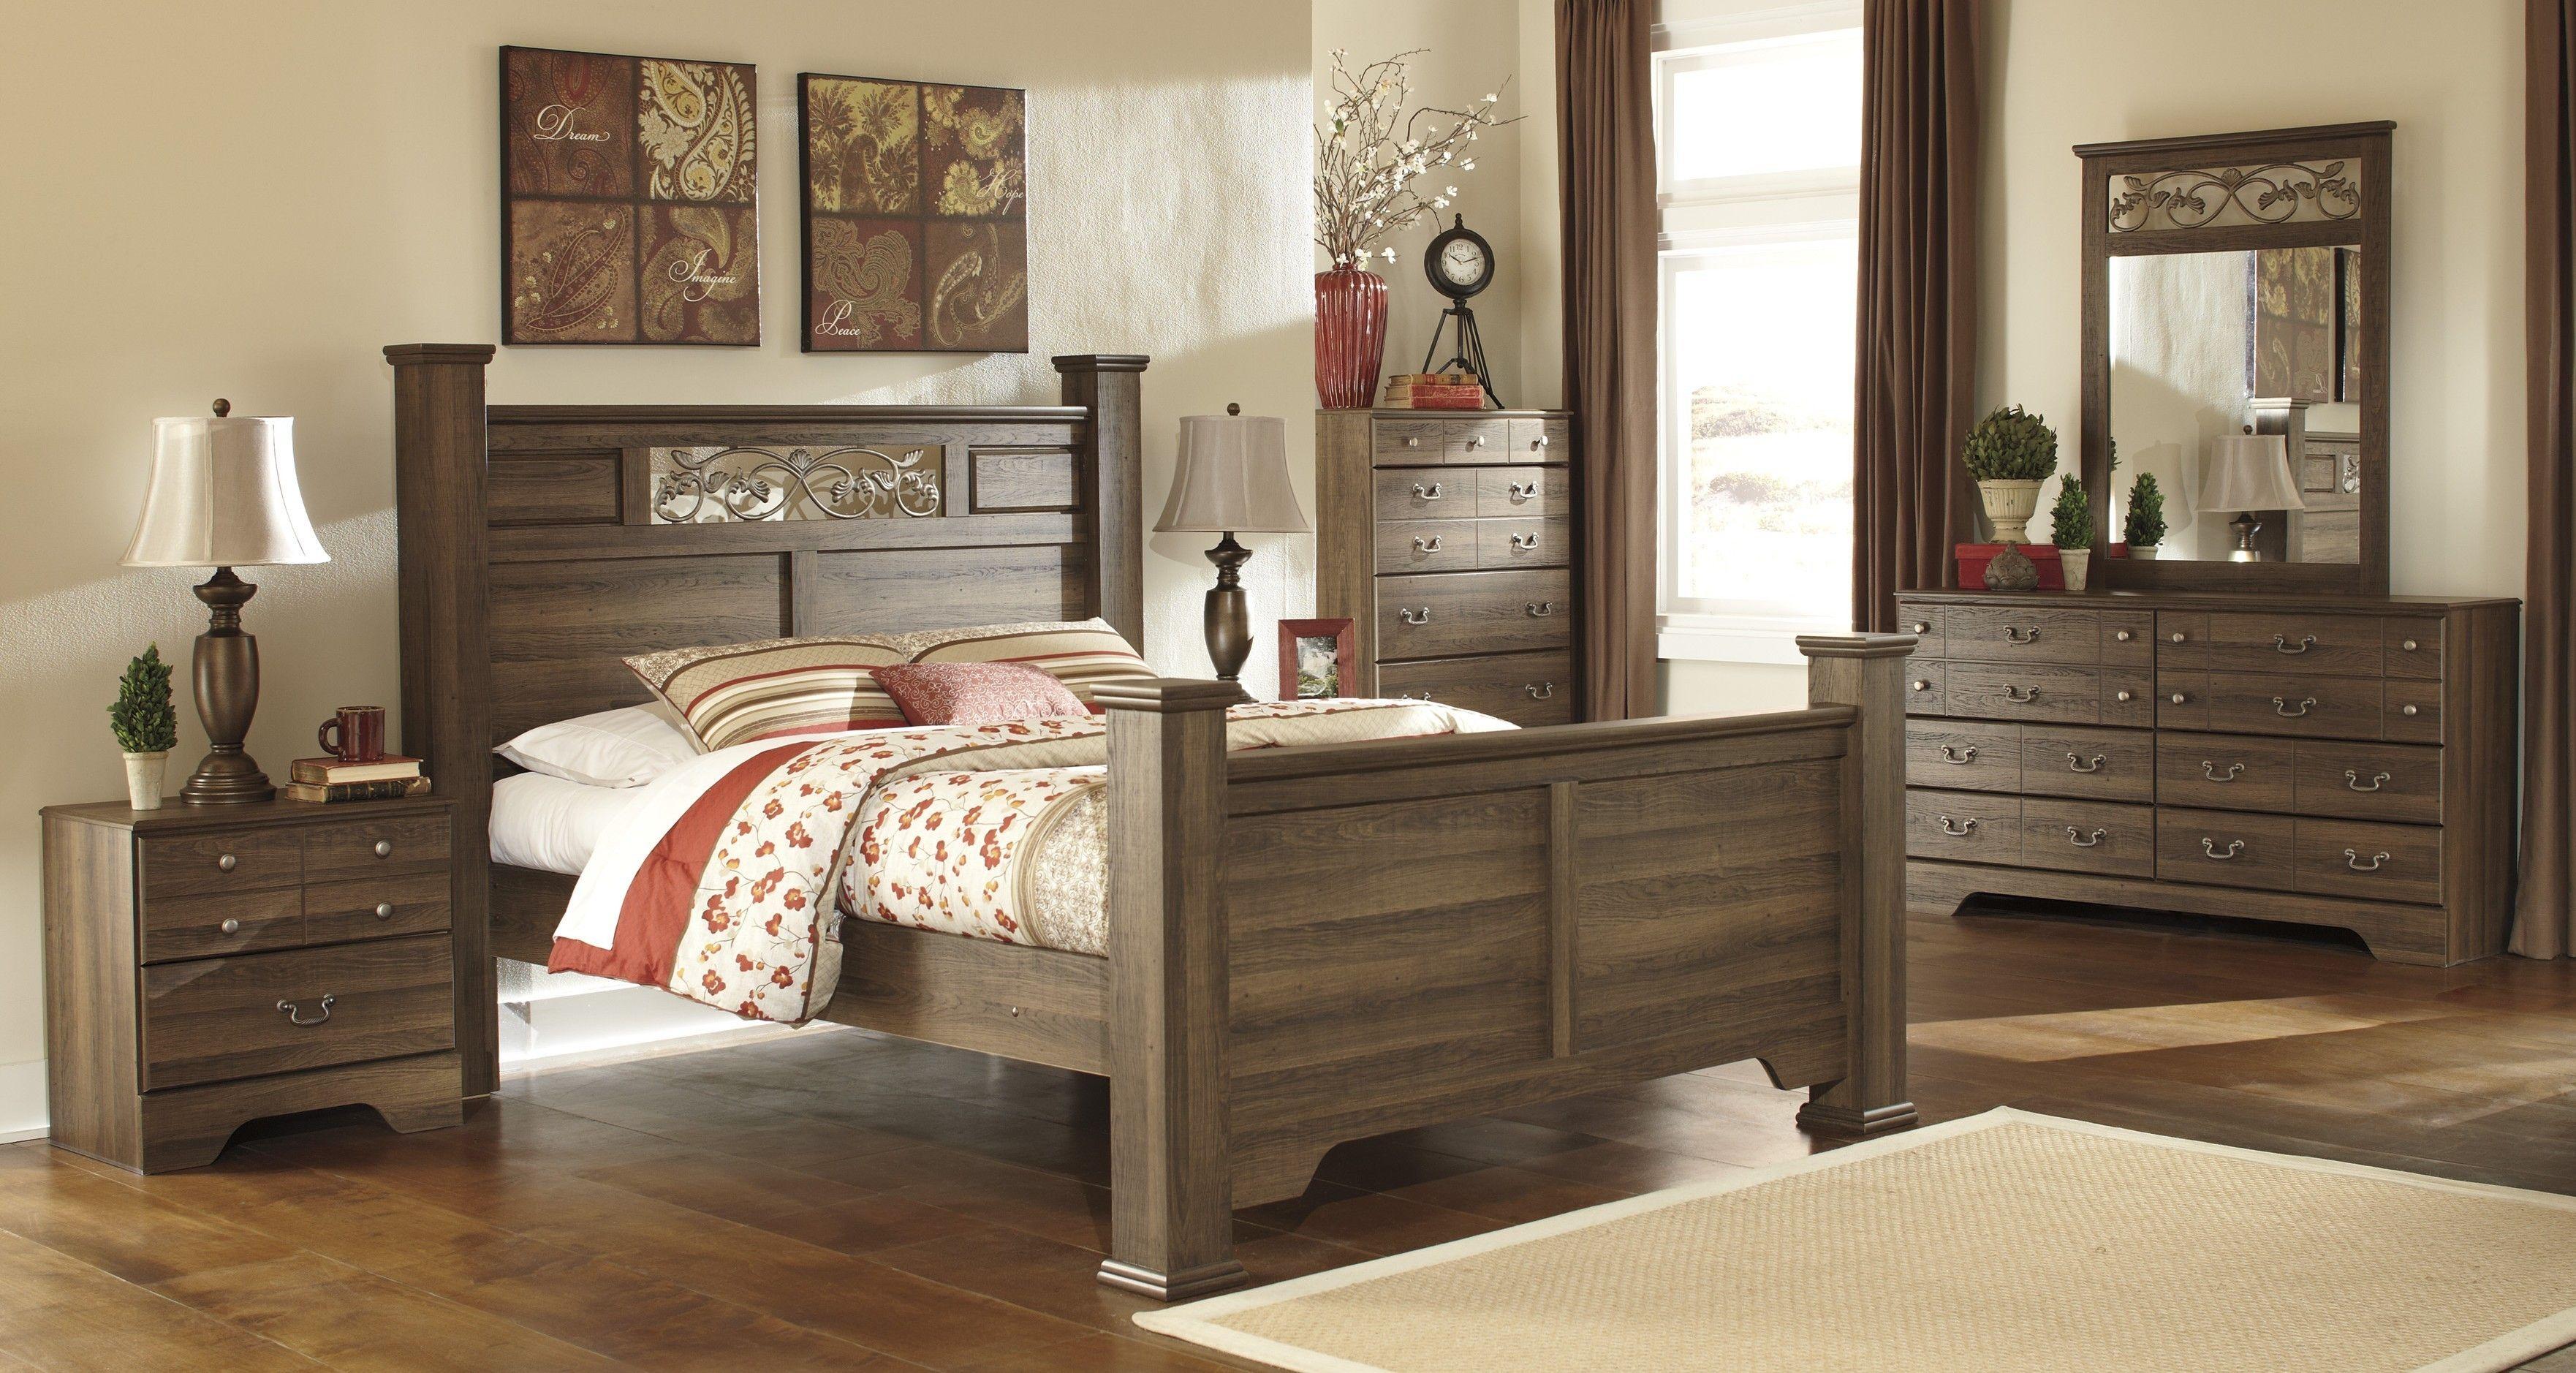 Ashley Furniture Signature Design Bedroom Set Pined's Discount Furniture On Bedroom Sets  Pinterest  Bedrooms